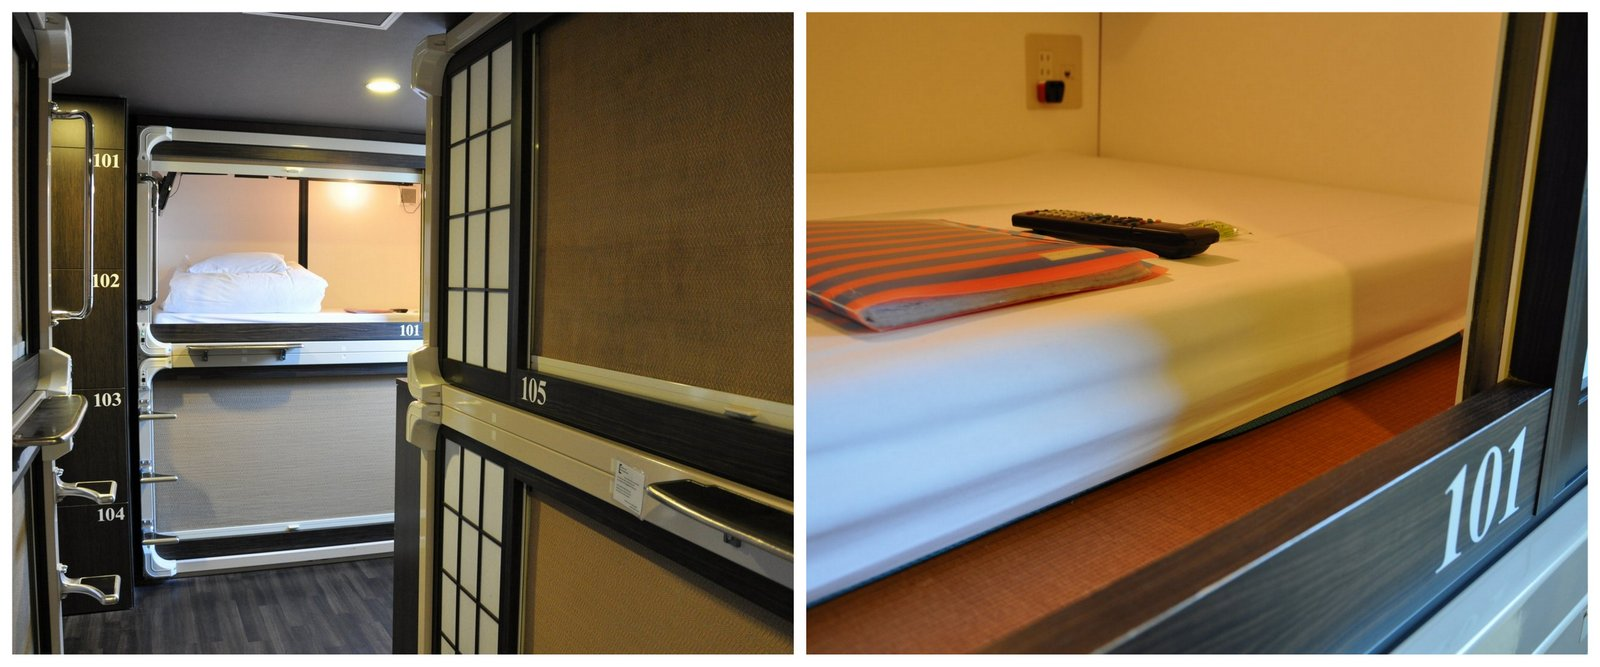 capsule-ryokan-kyoto-hotel-pas-cher